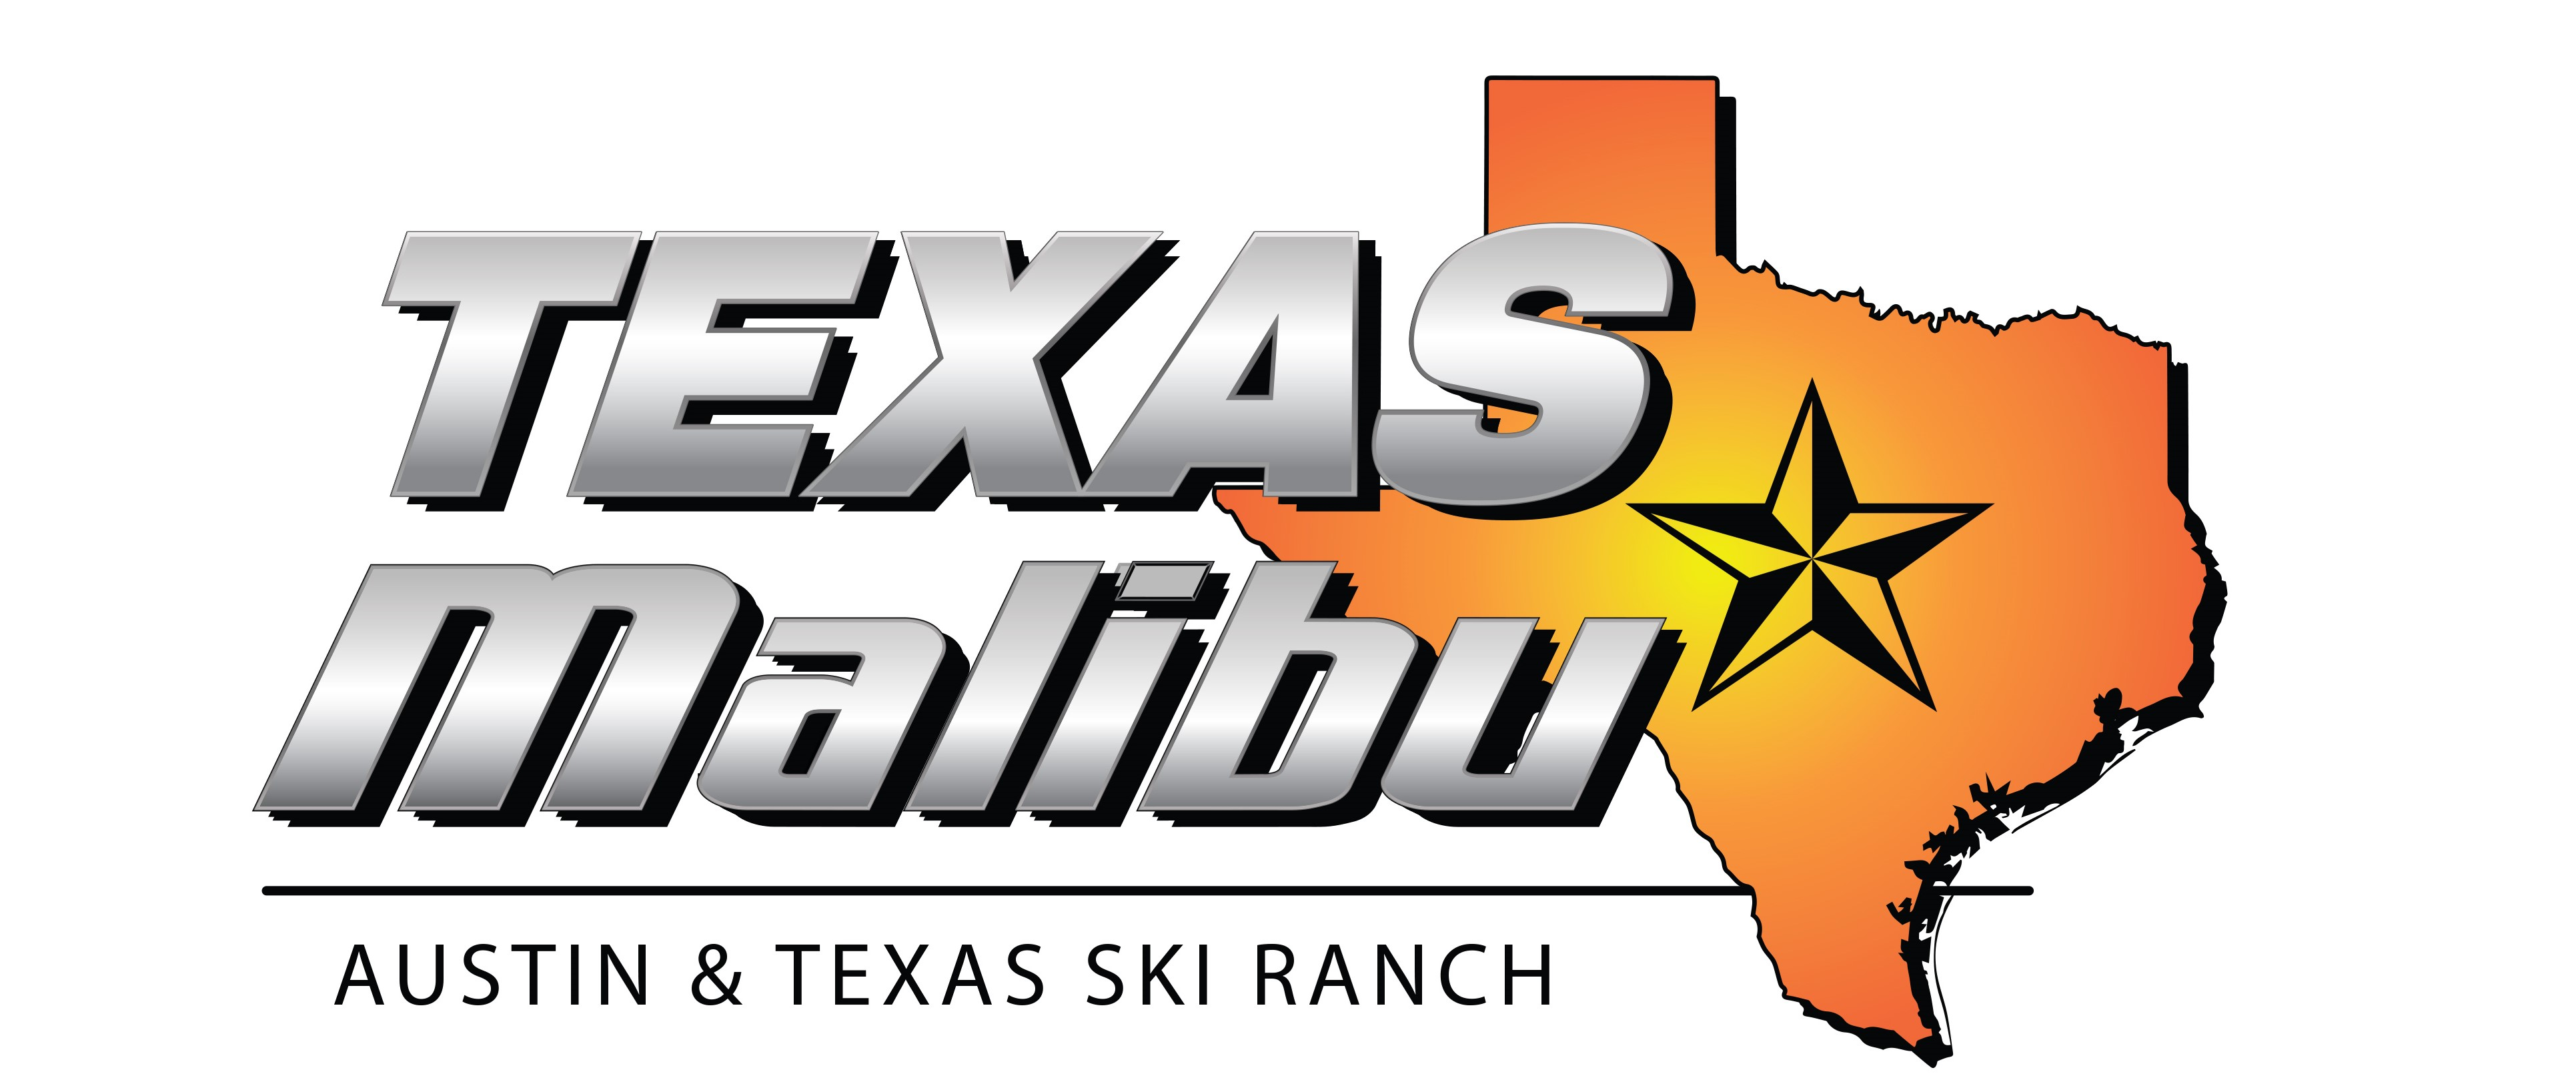 Texas Malibu logo